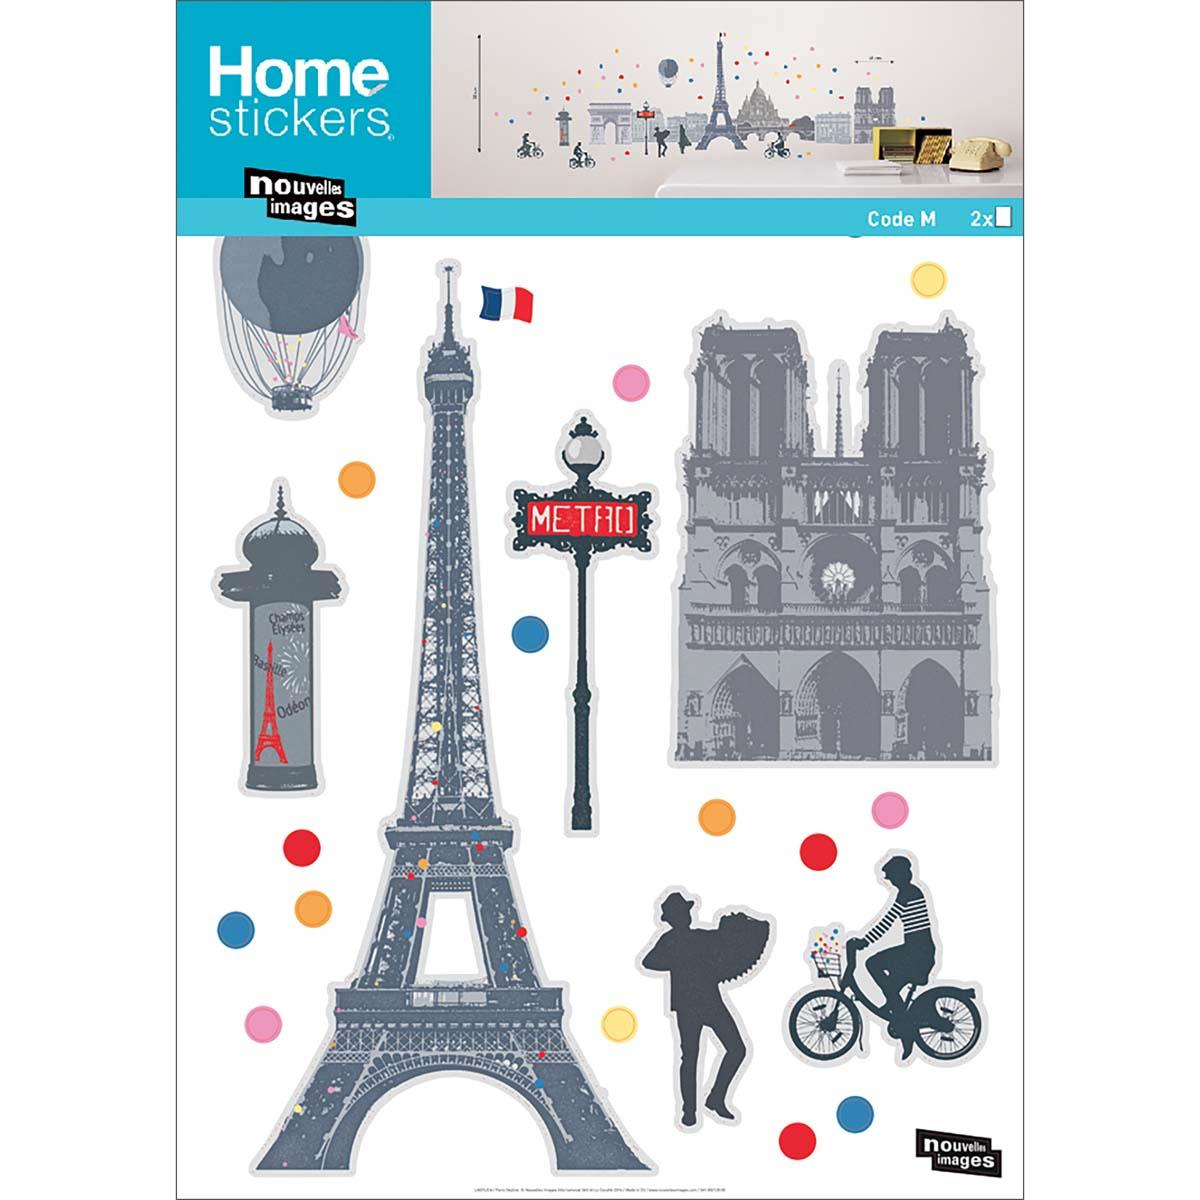 Ref-170-002025-03-5-DRAEGER-Lot-de-5-Stickers-mural-Paris-Multicolore miniature 2